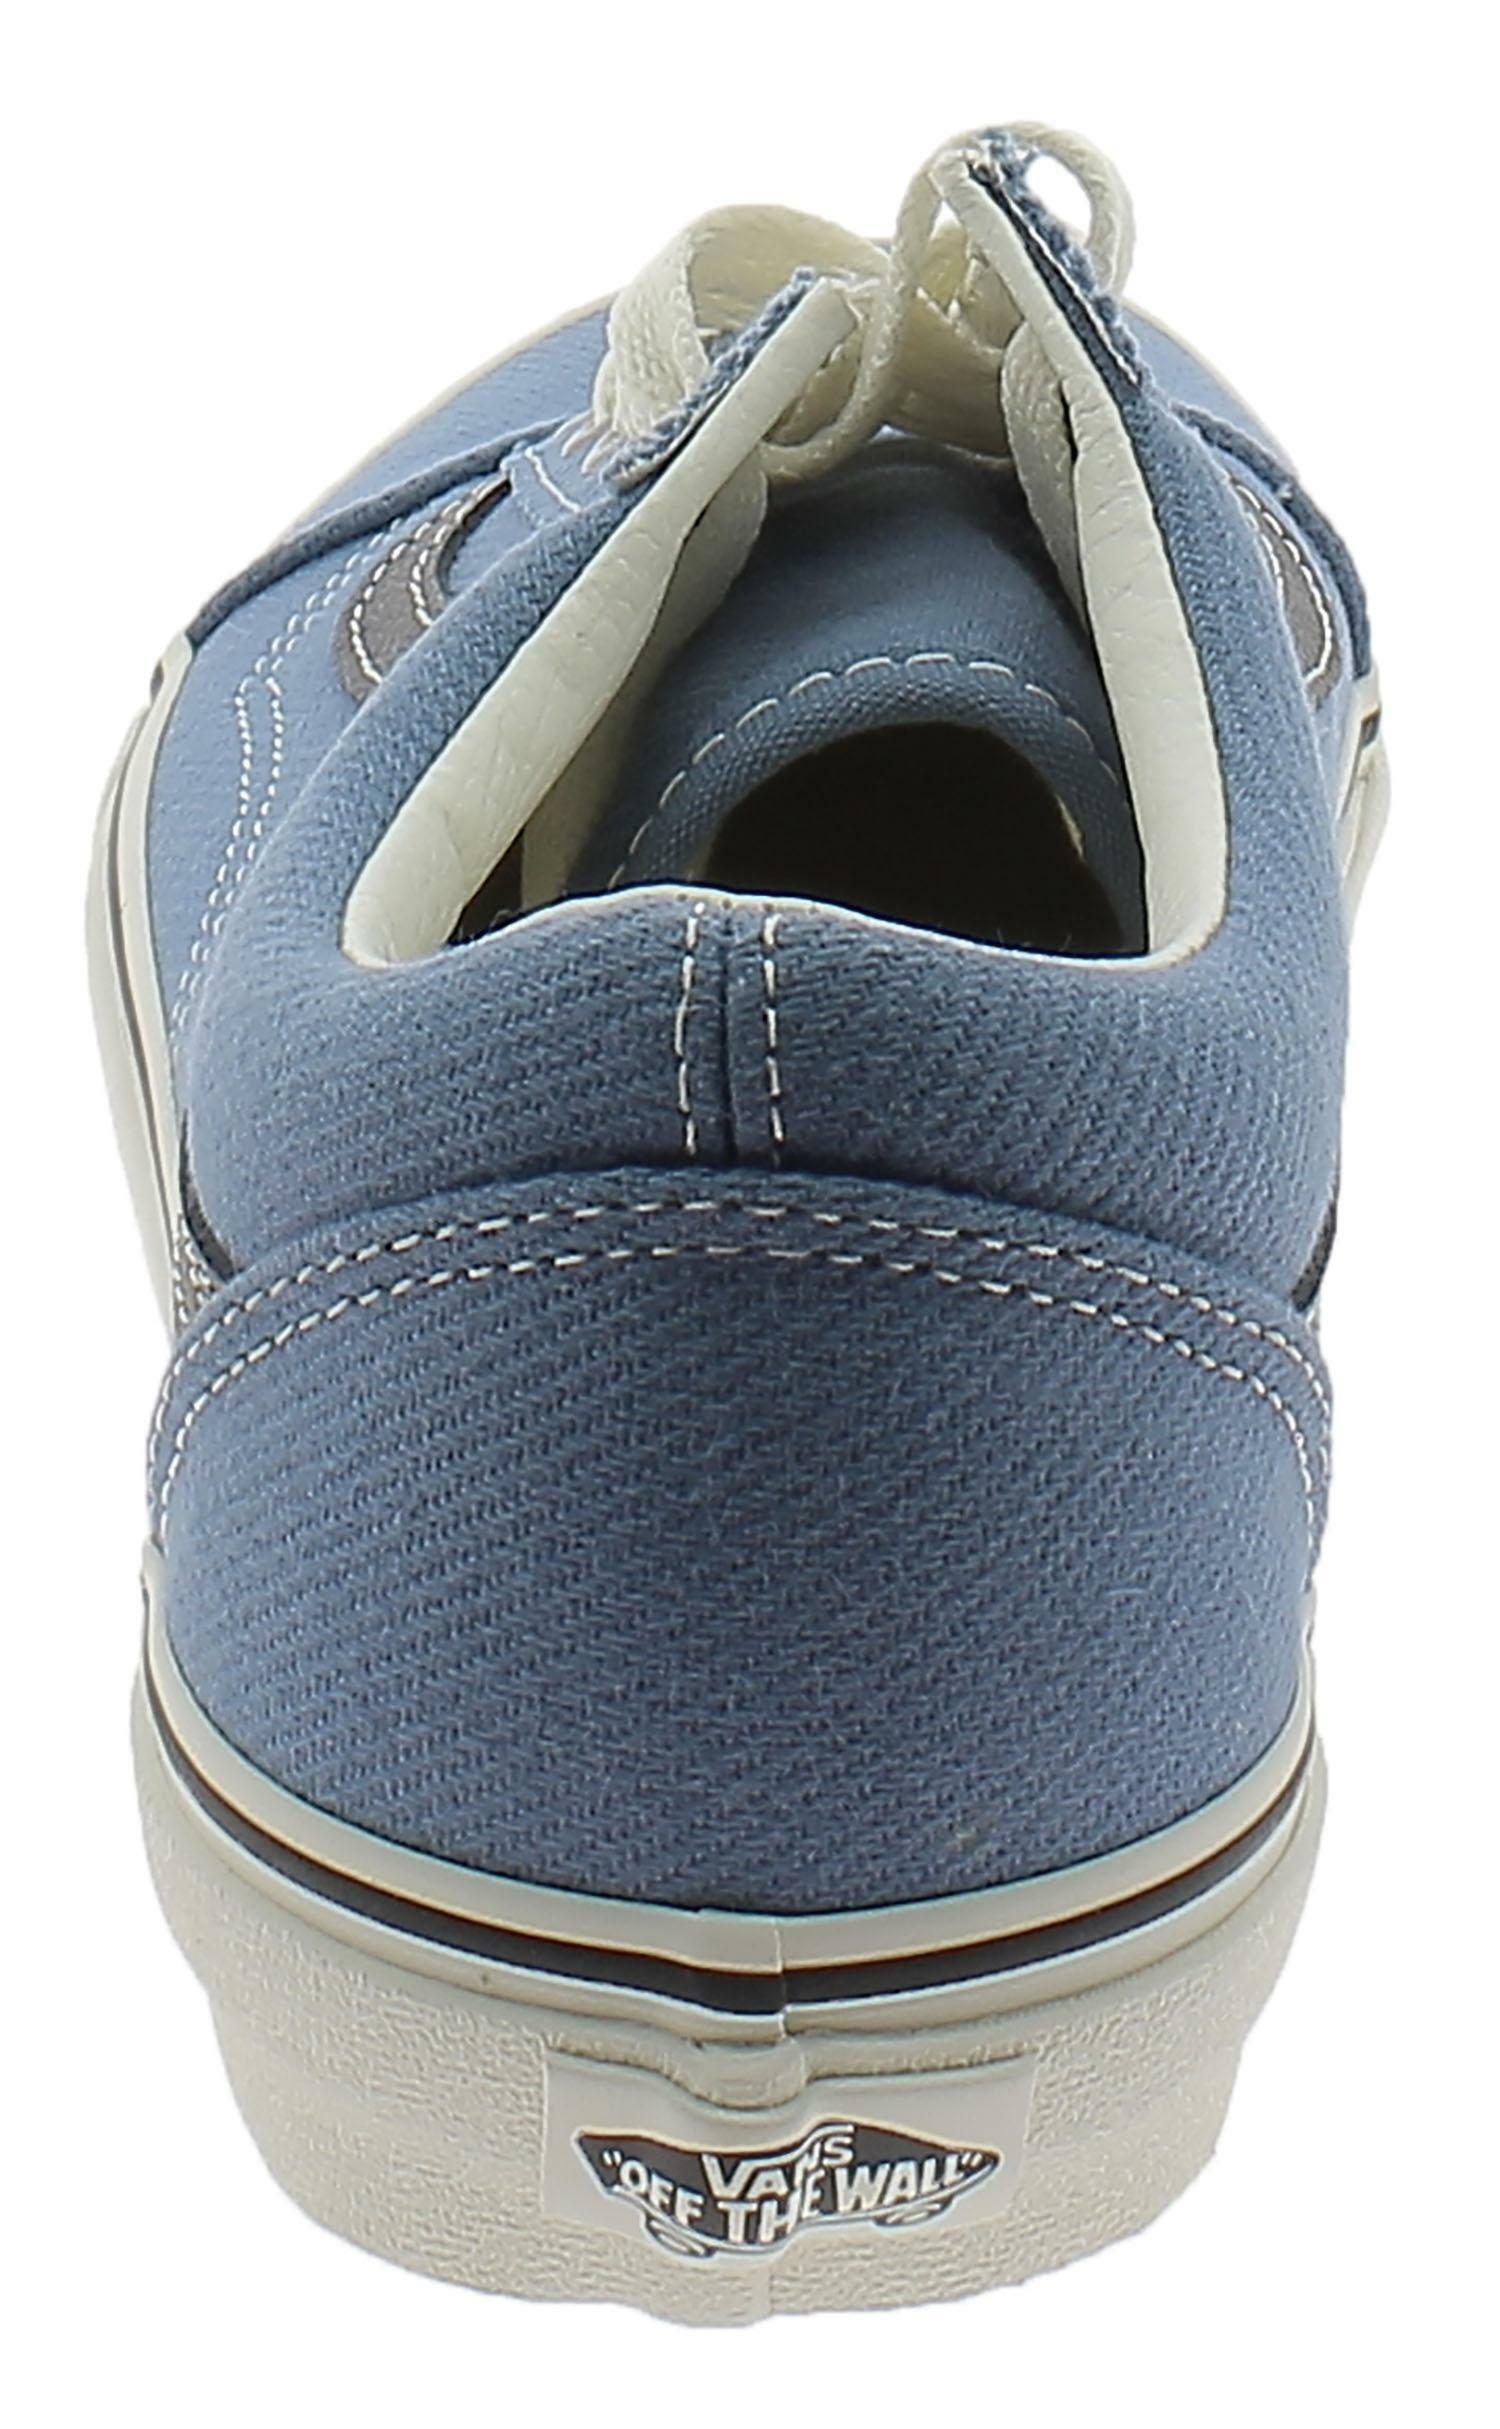 Scarpe sportive vans old skool vn0a38g121k1 uomo azzurre